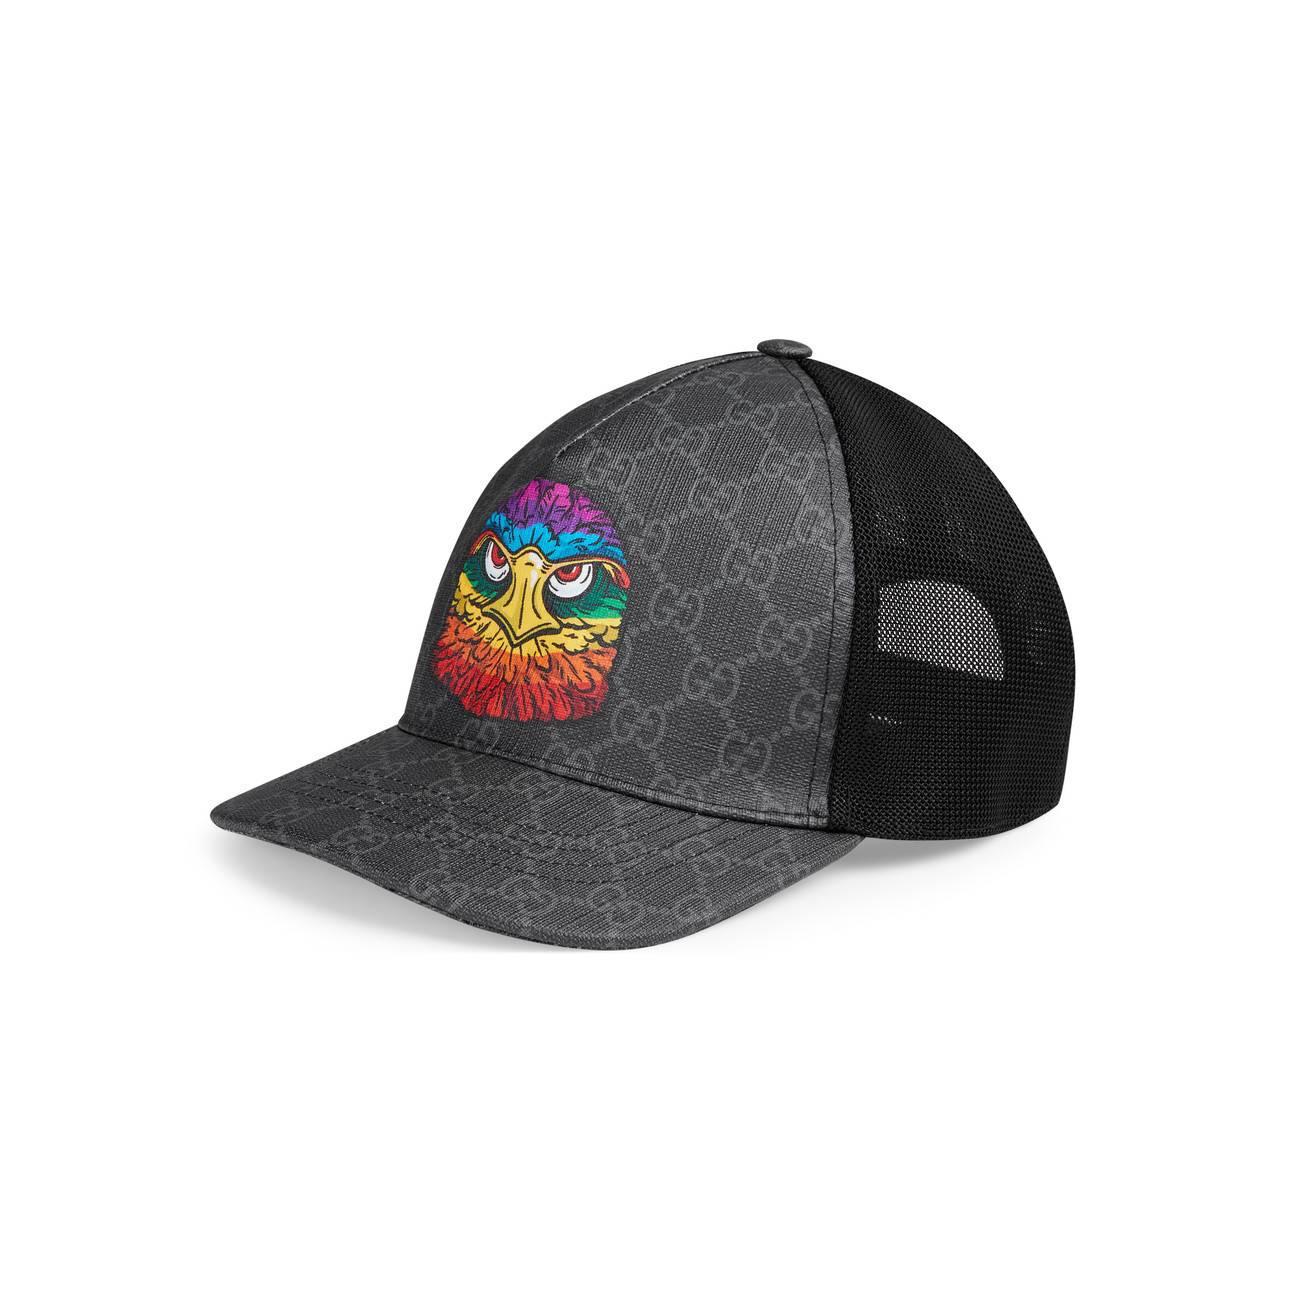 4b0a9f473fa Gucci GG Supreme Baseball Hat With Eagle in Black for Men - Lyst